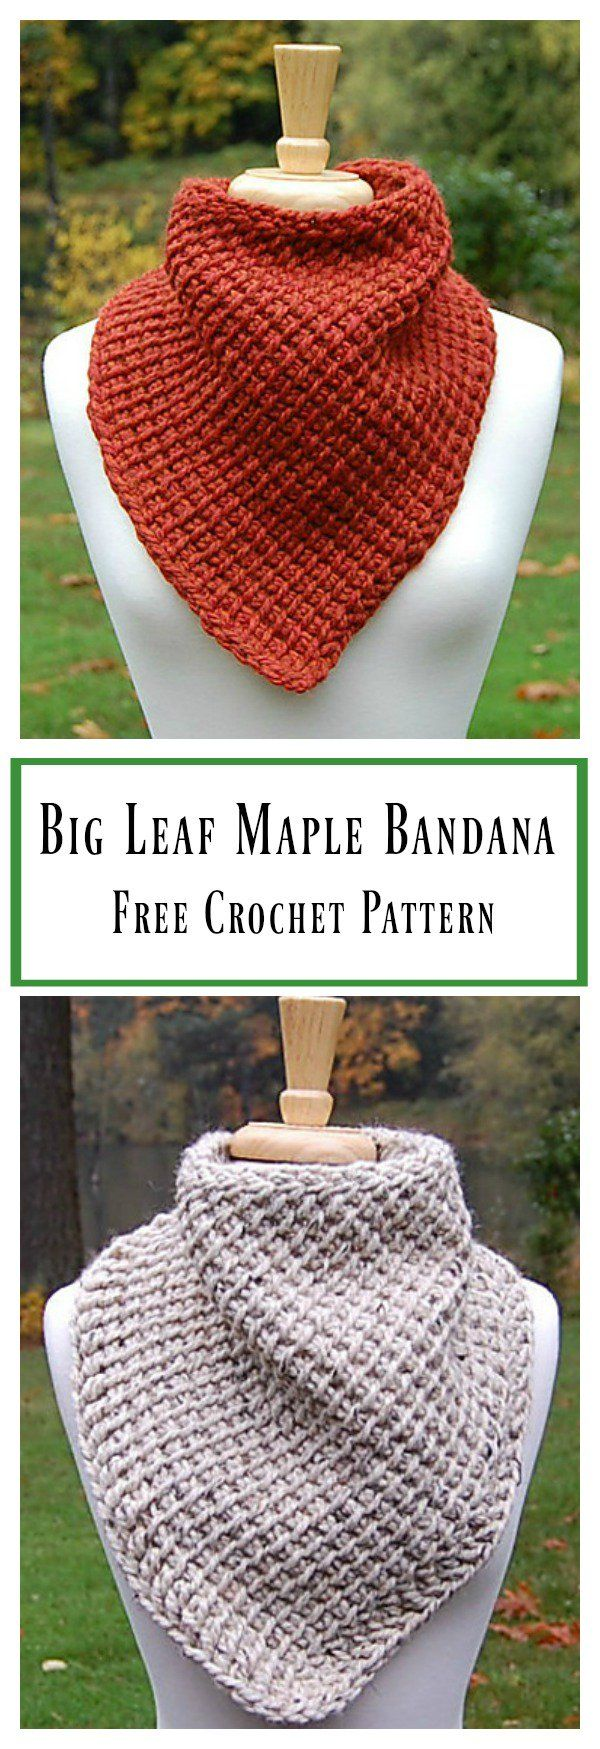 Big Leaf Maple Bandana Cowl Free Crochet Pattern